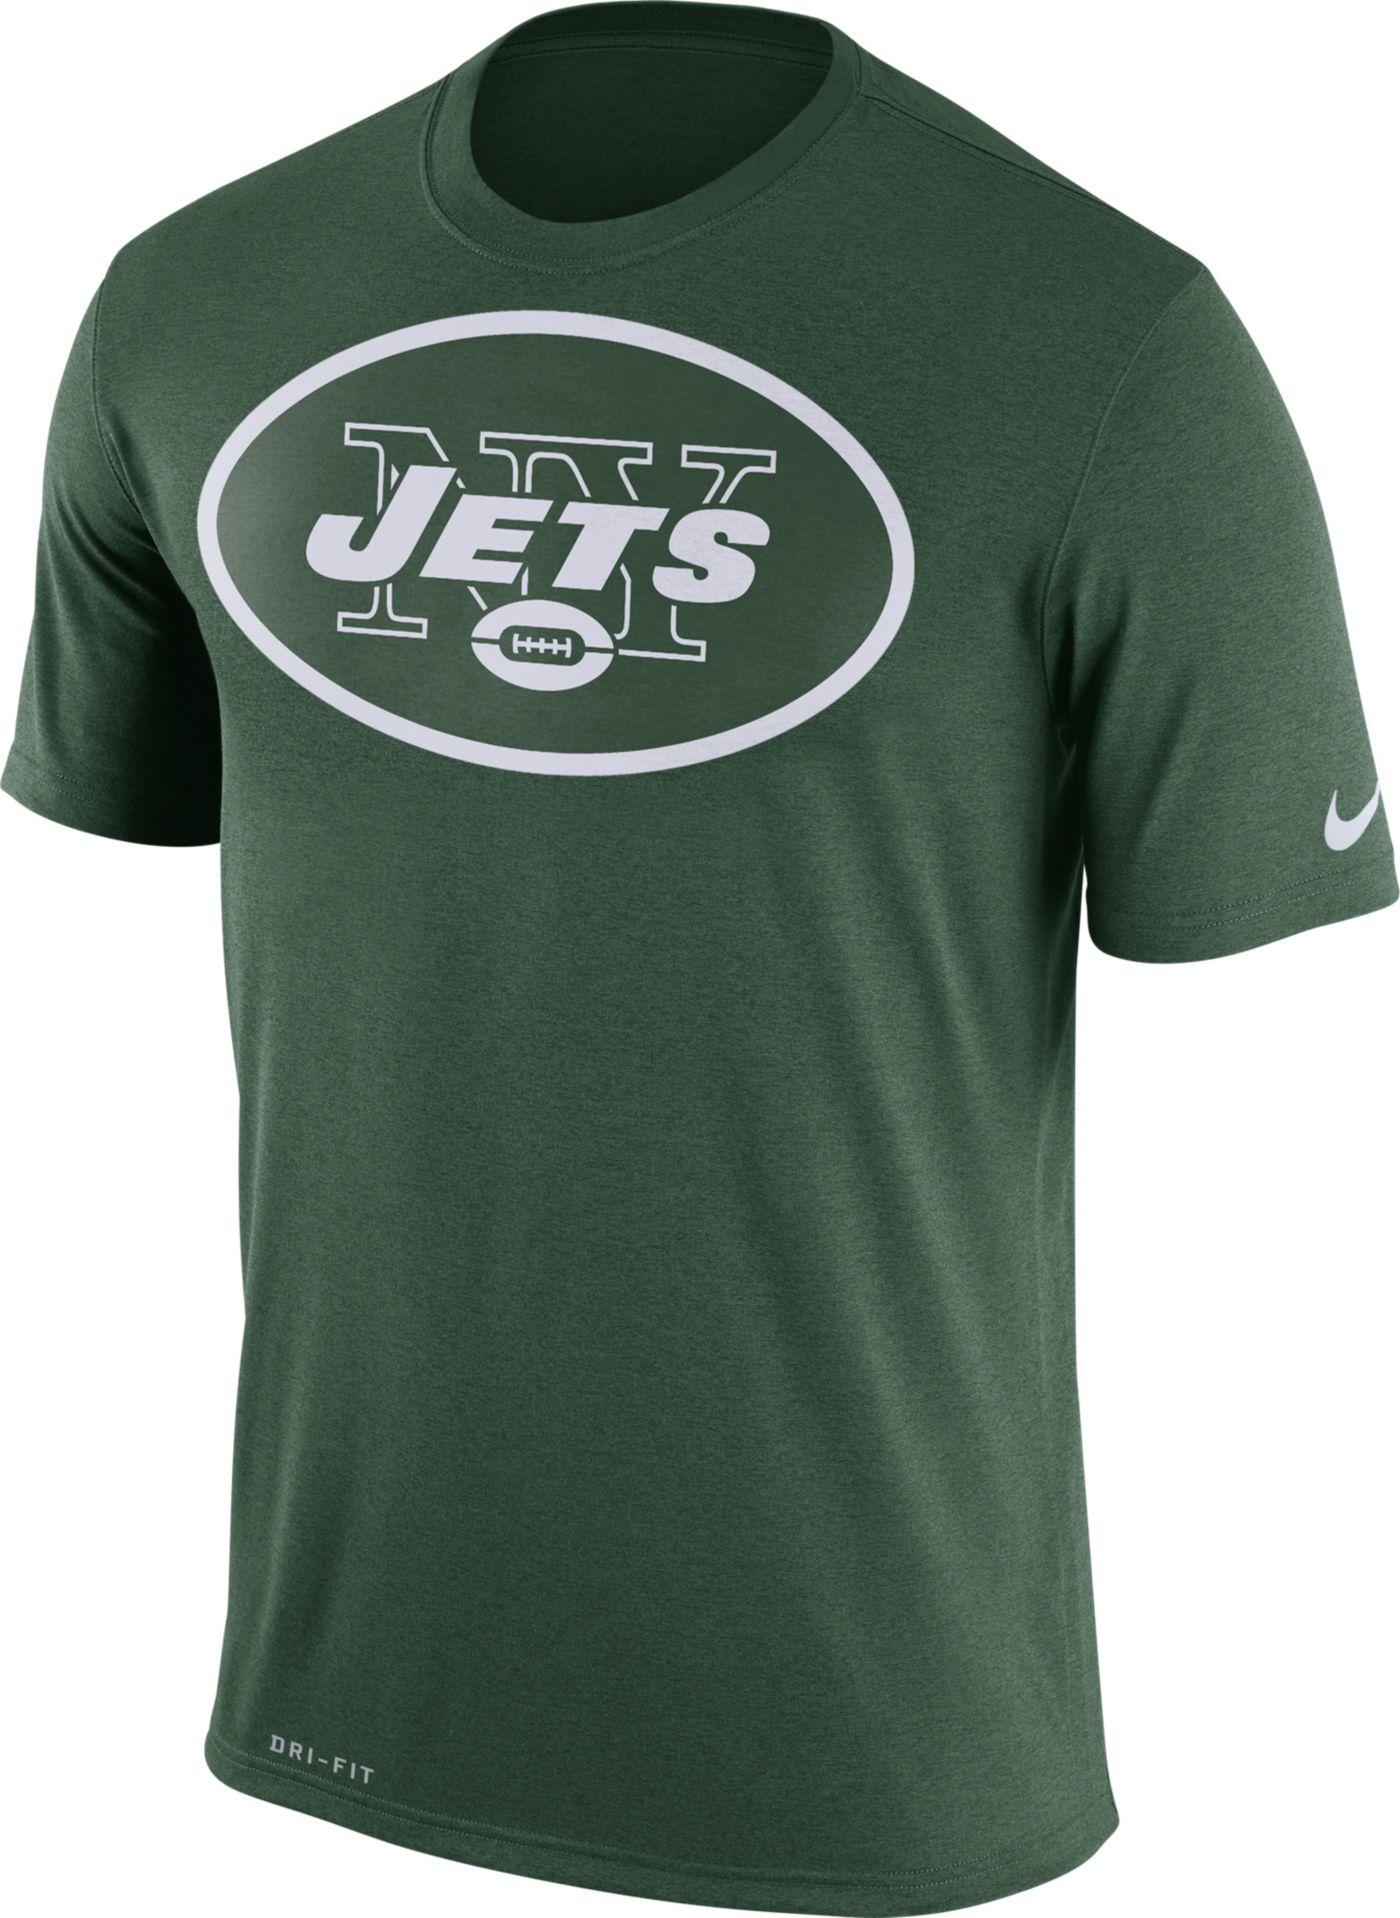 Nike Men's New York Jets Legend Logo Green T-Shirt